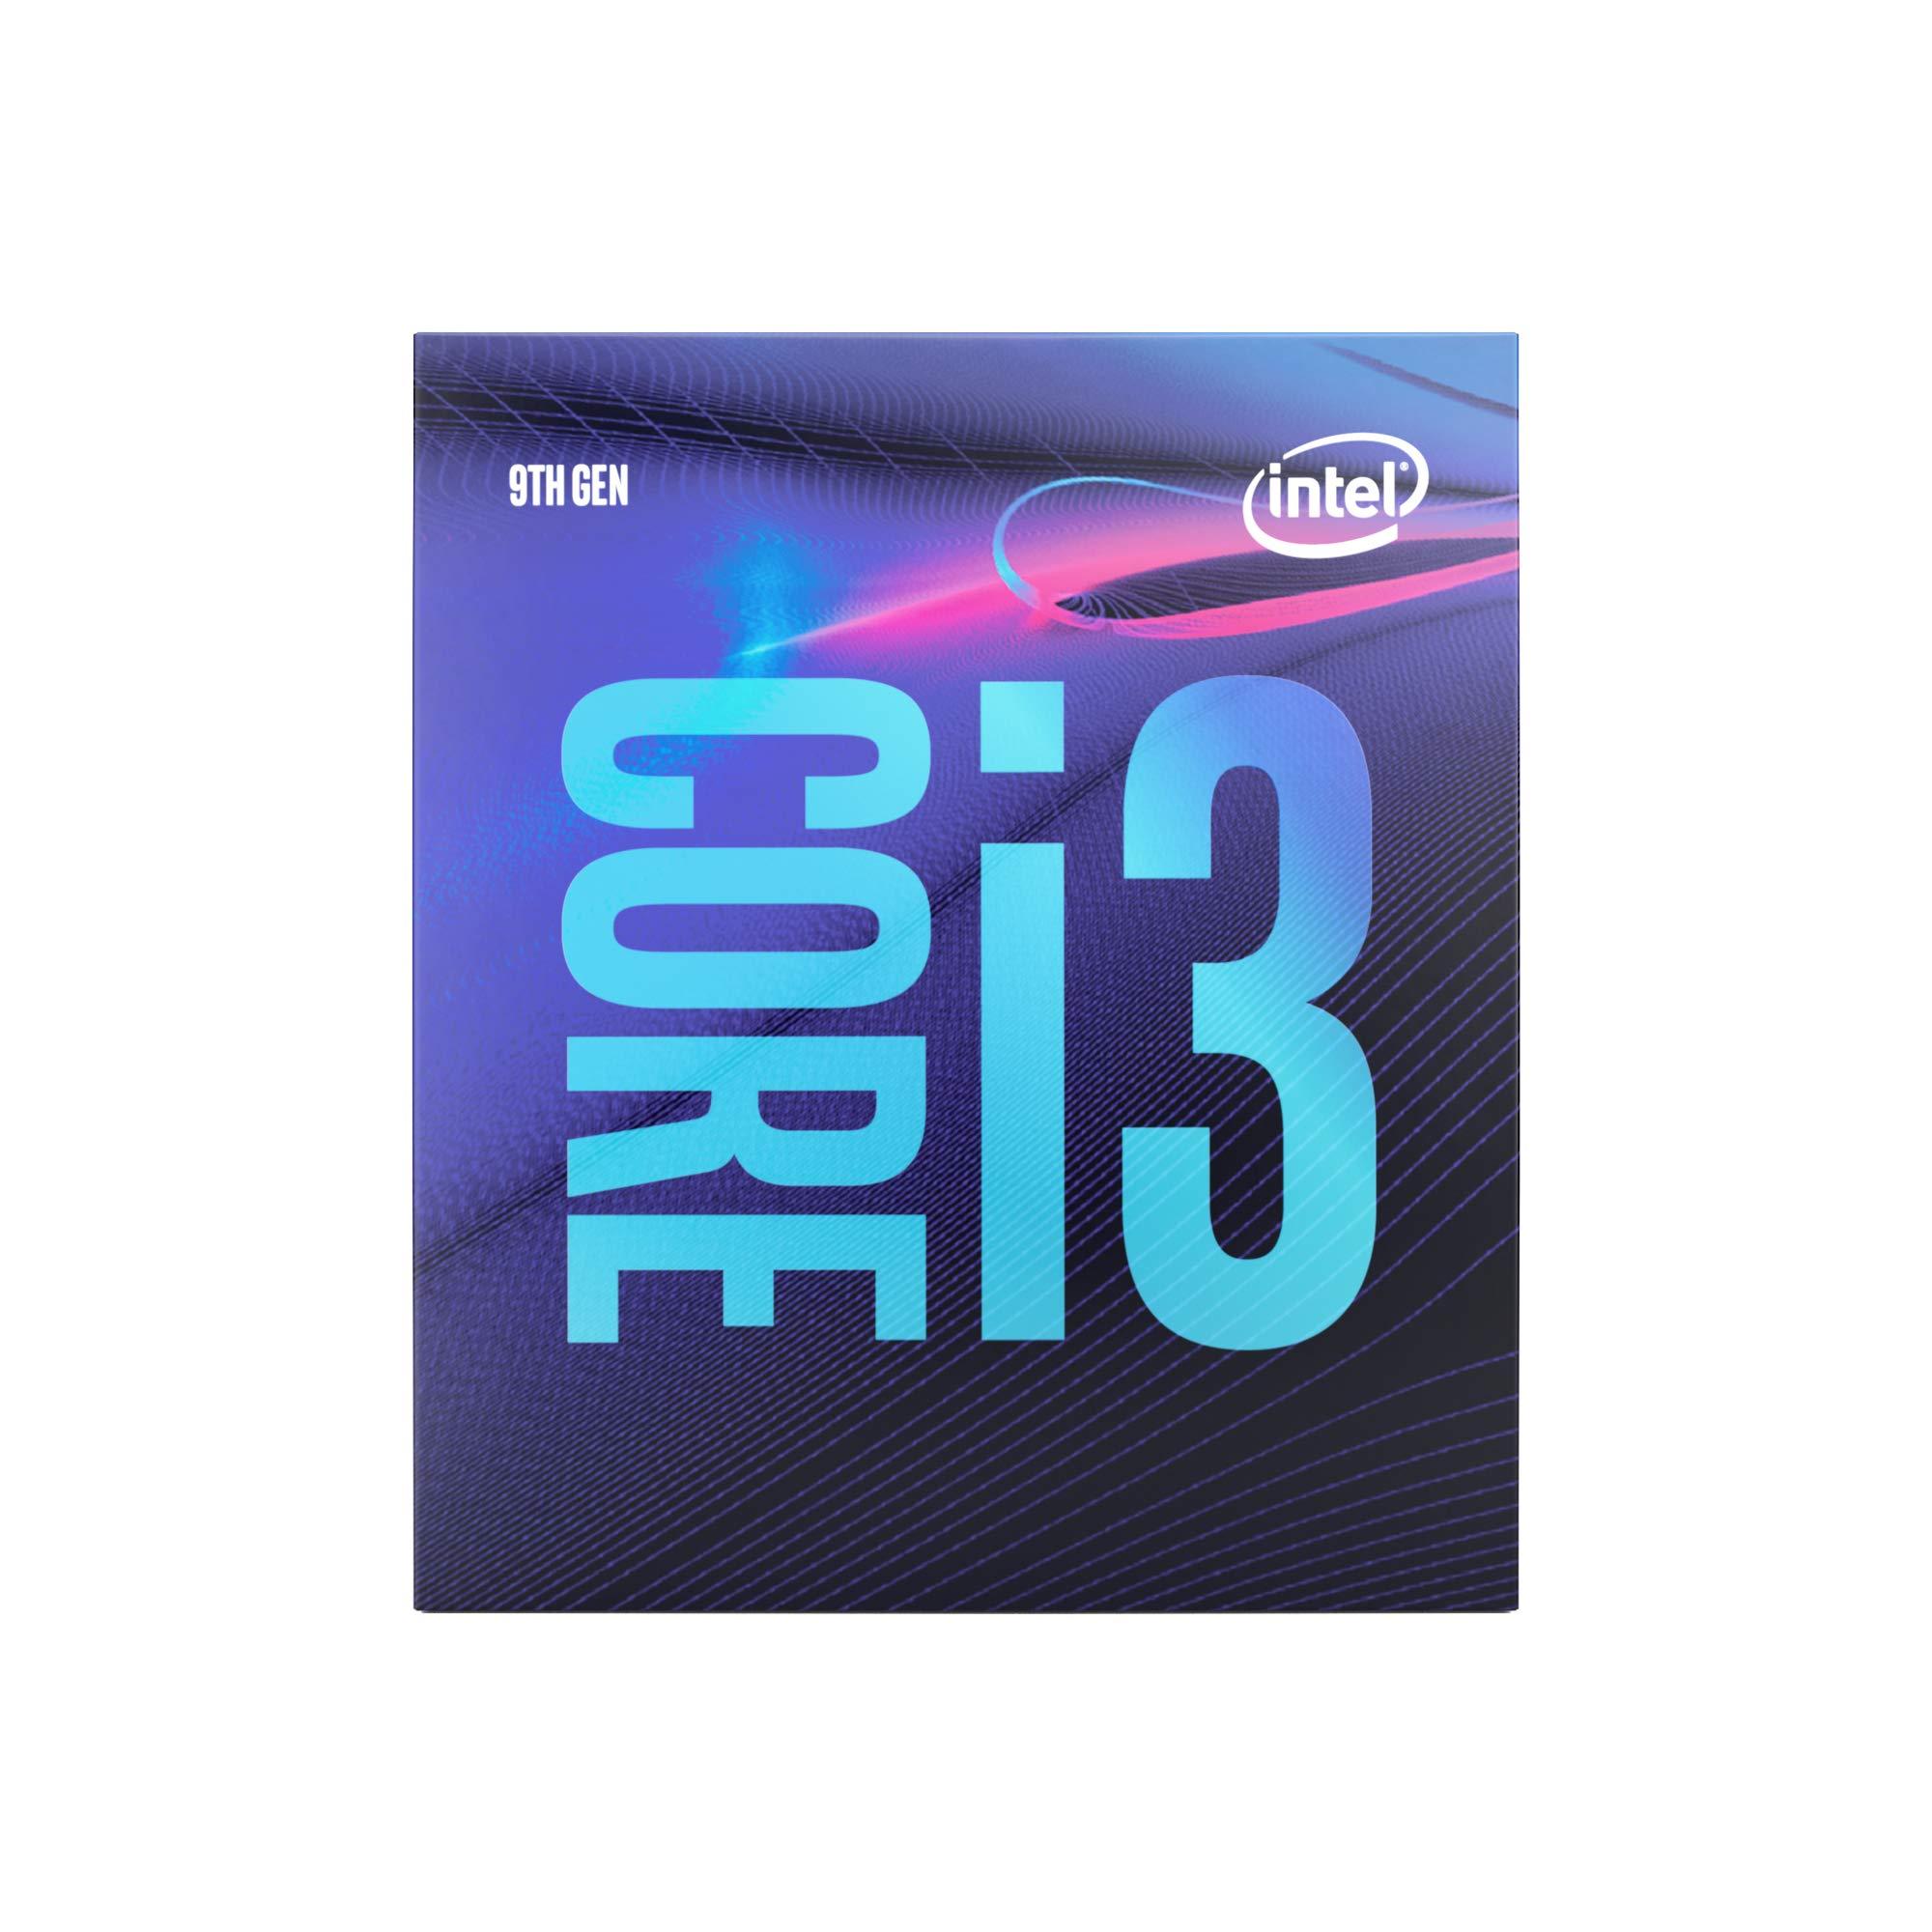 Intel Core i3-9100 Desktop Processor 4 Cores up to 4.2 GHz LGA1151 300 Series 65W by Intel